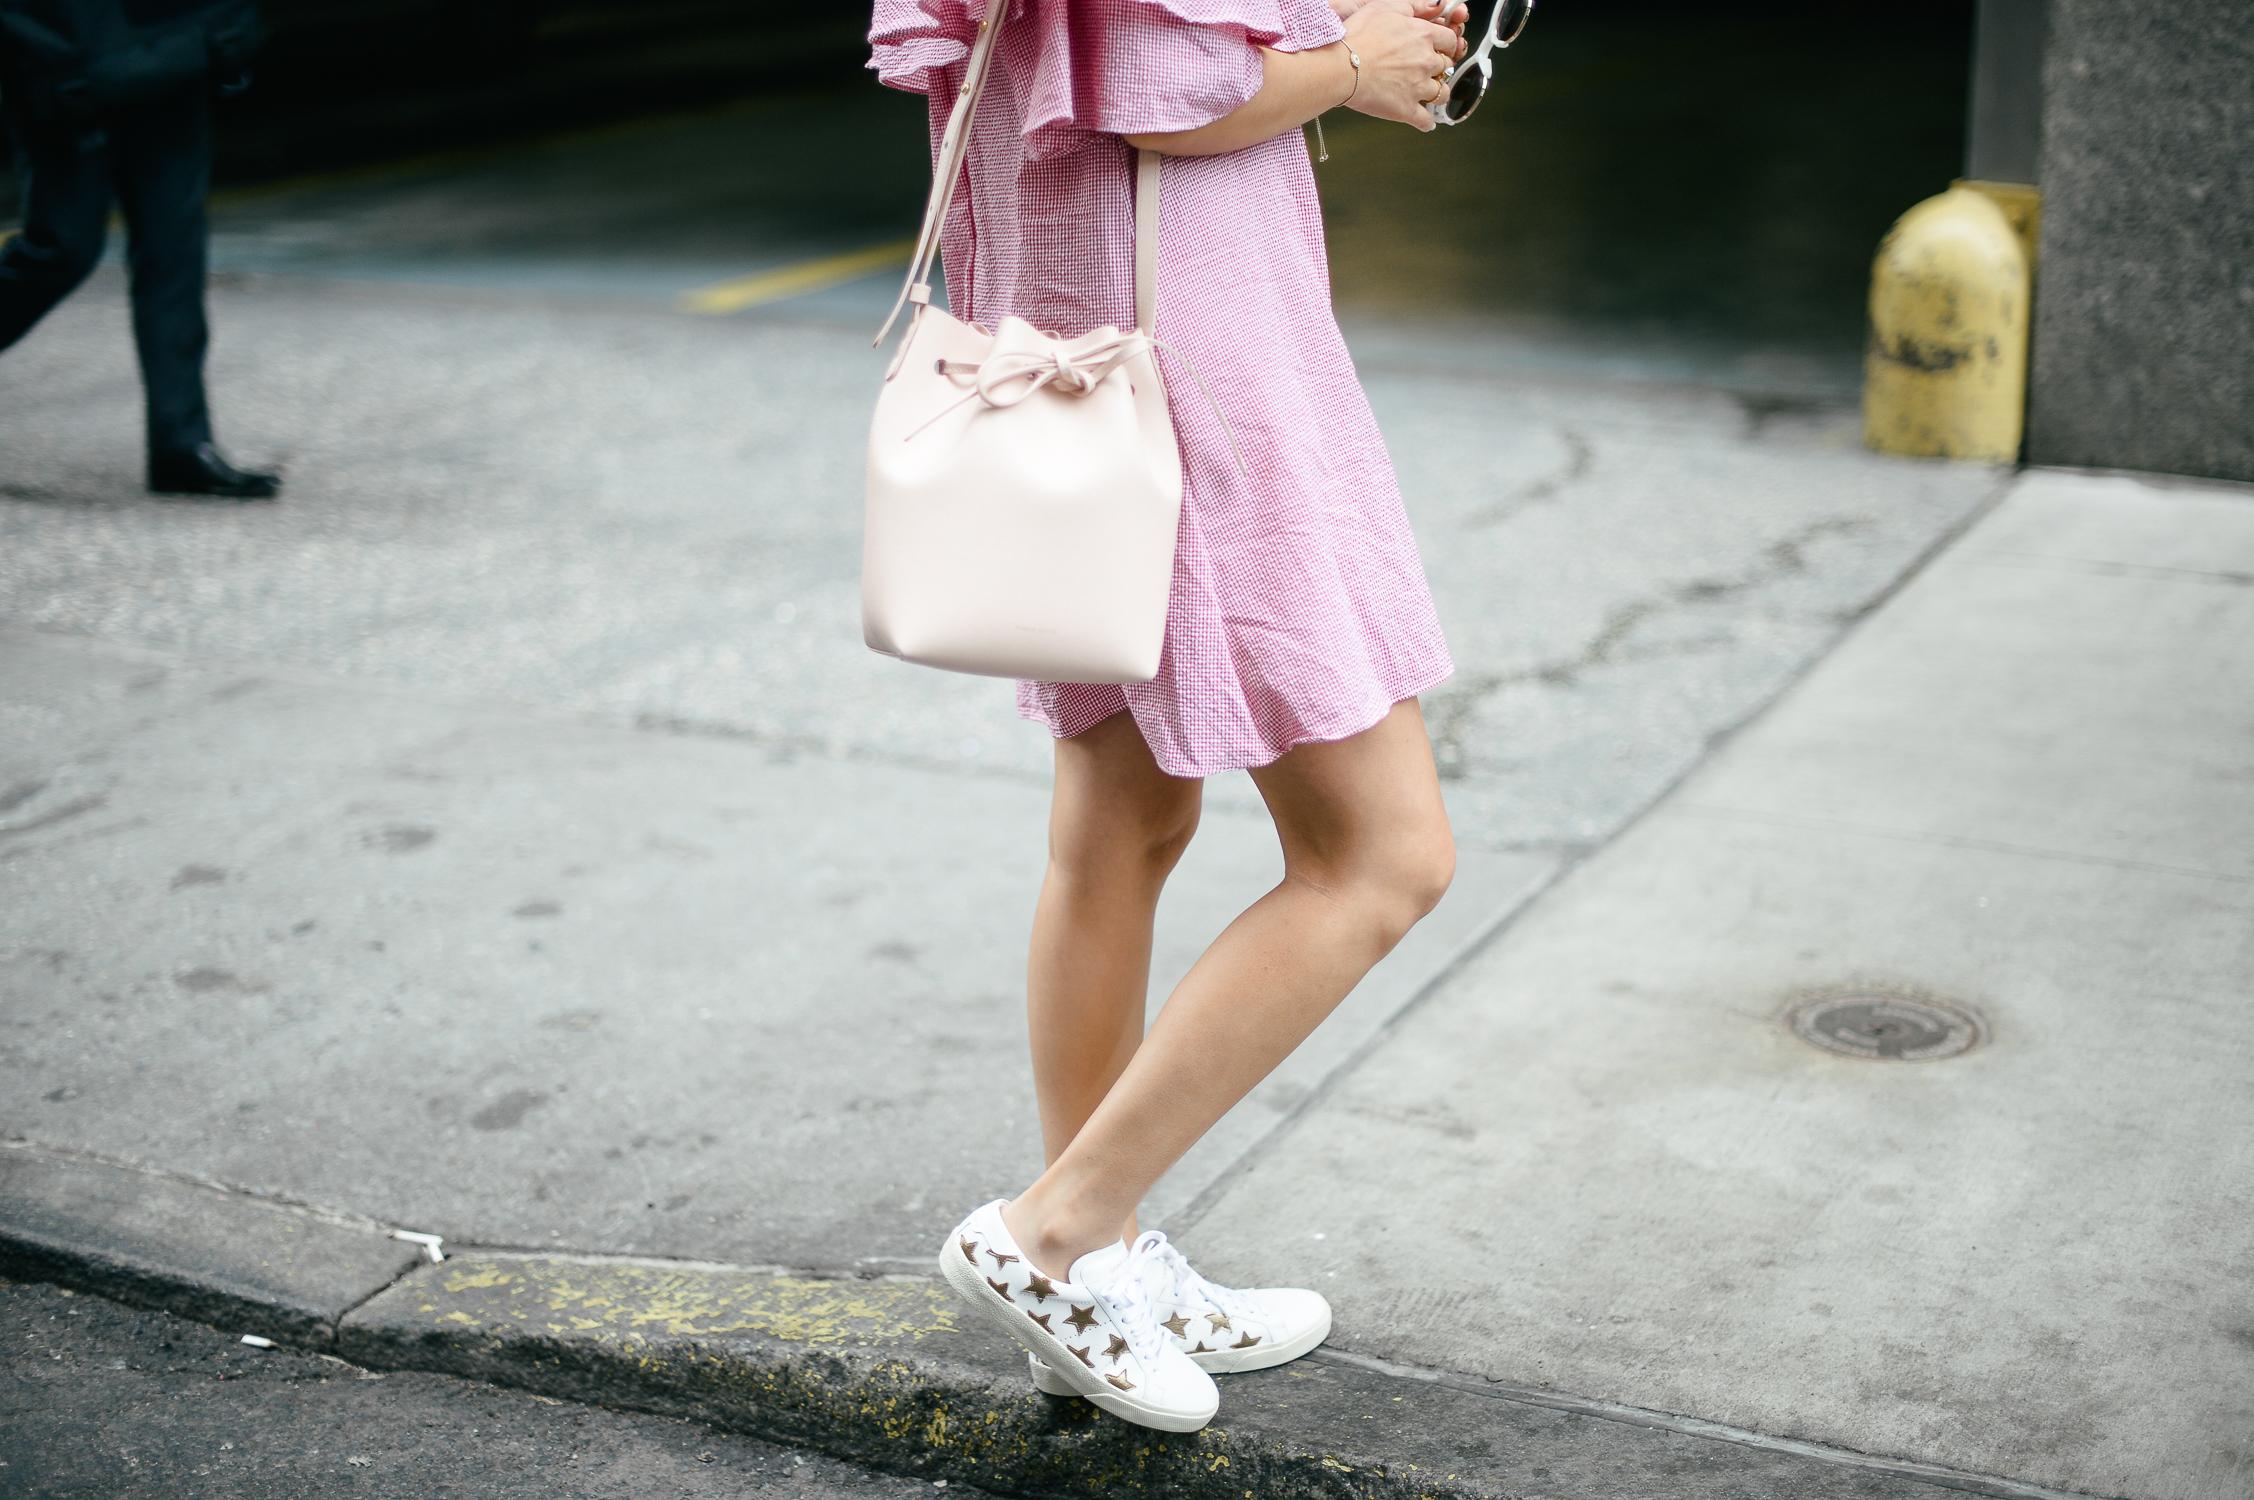 Mba Saint Sneakers Style Laurent Star wqYA6a